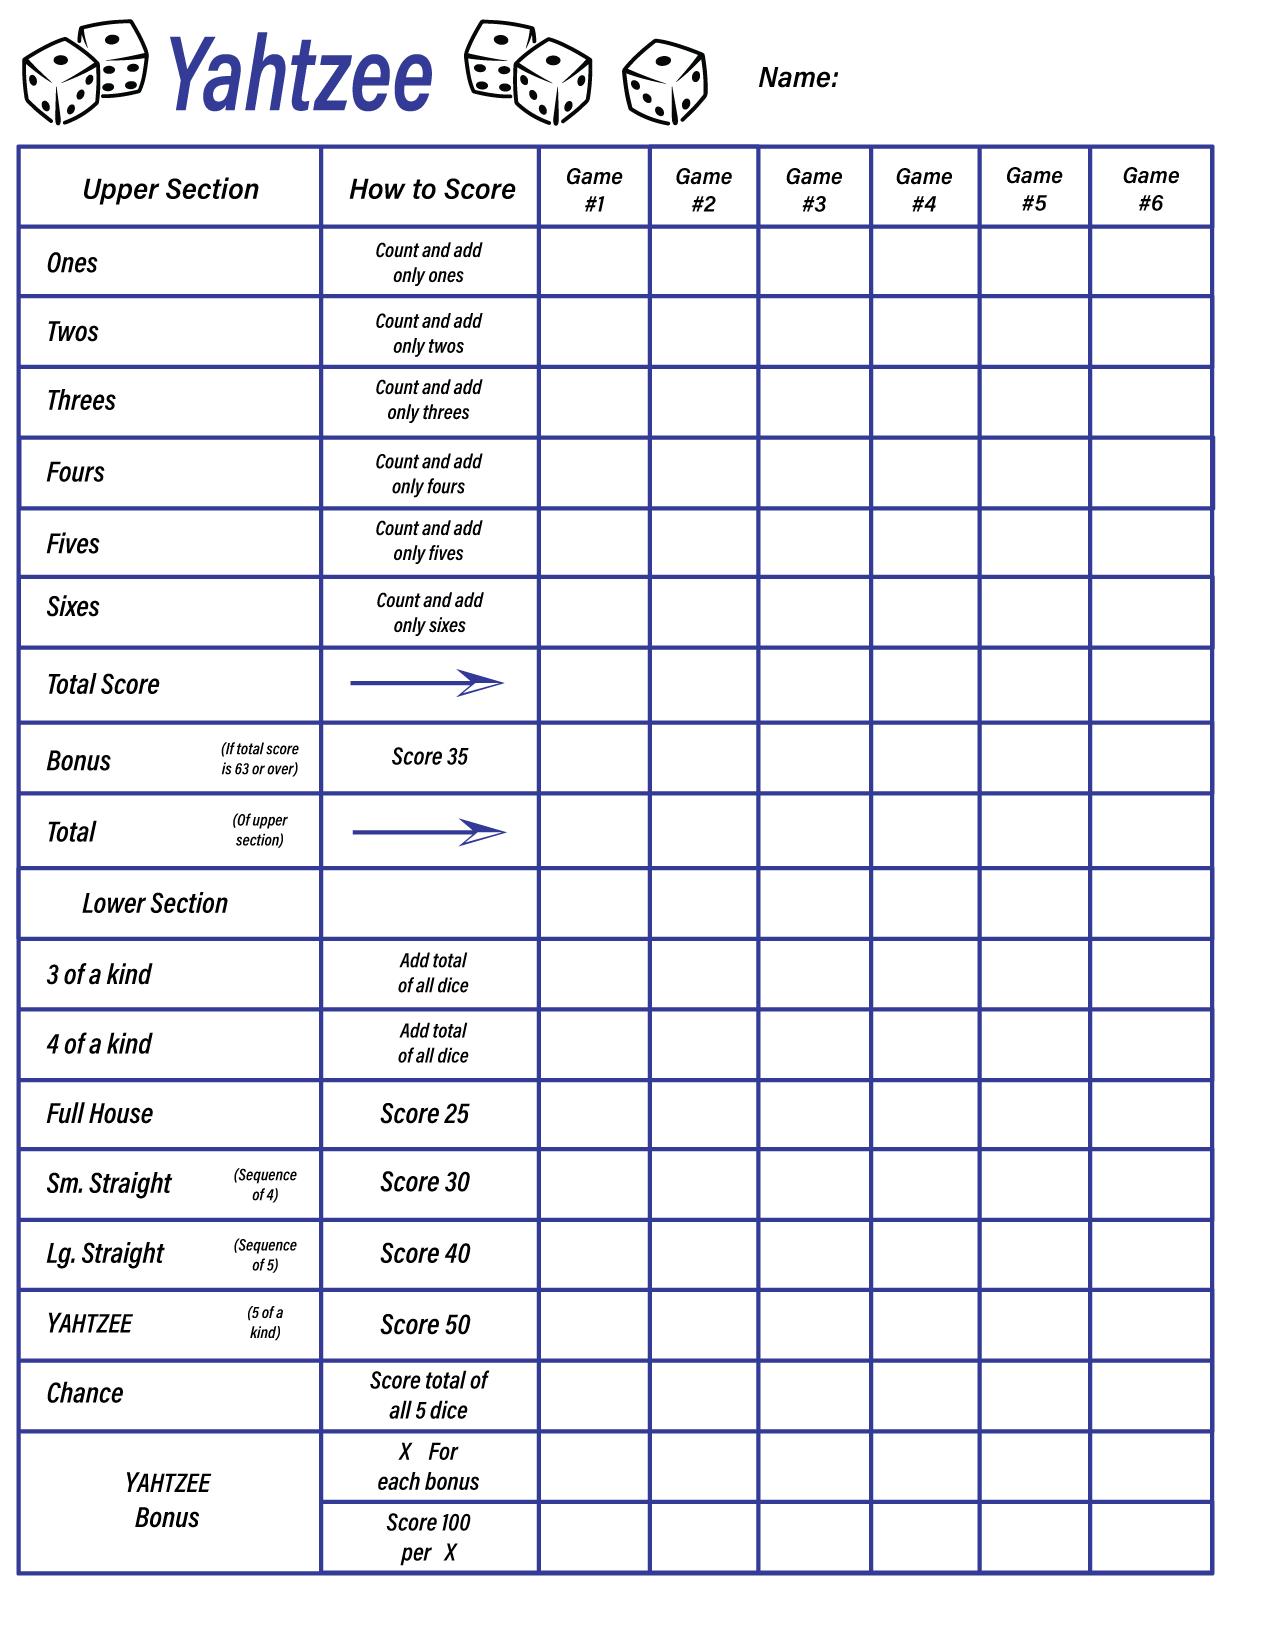 blank yahtzee score sheets to print